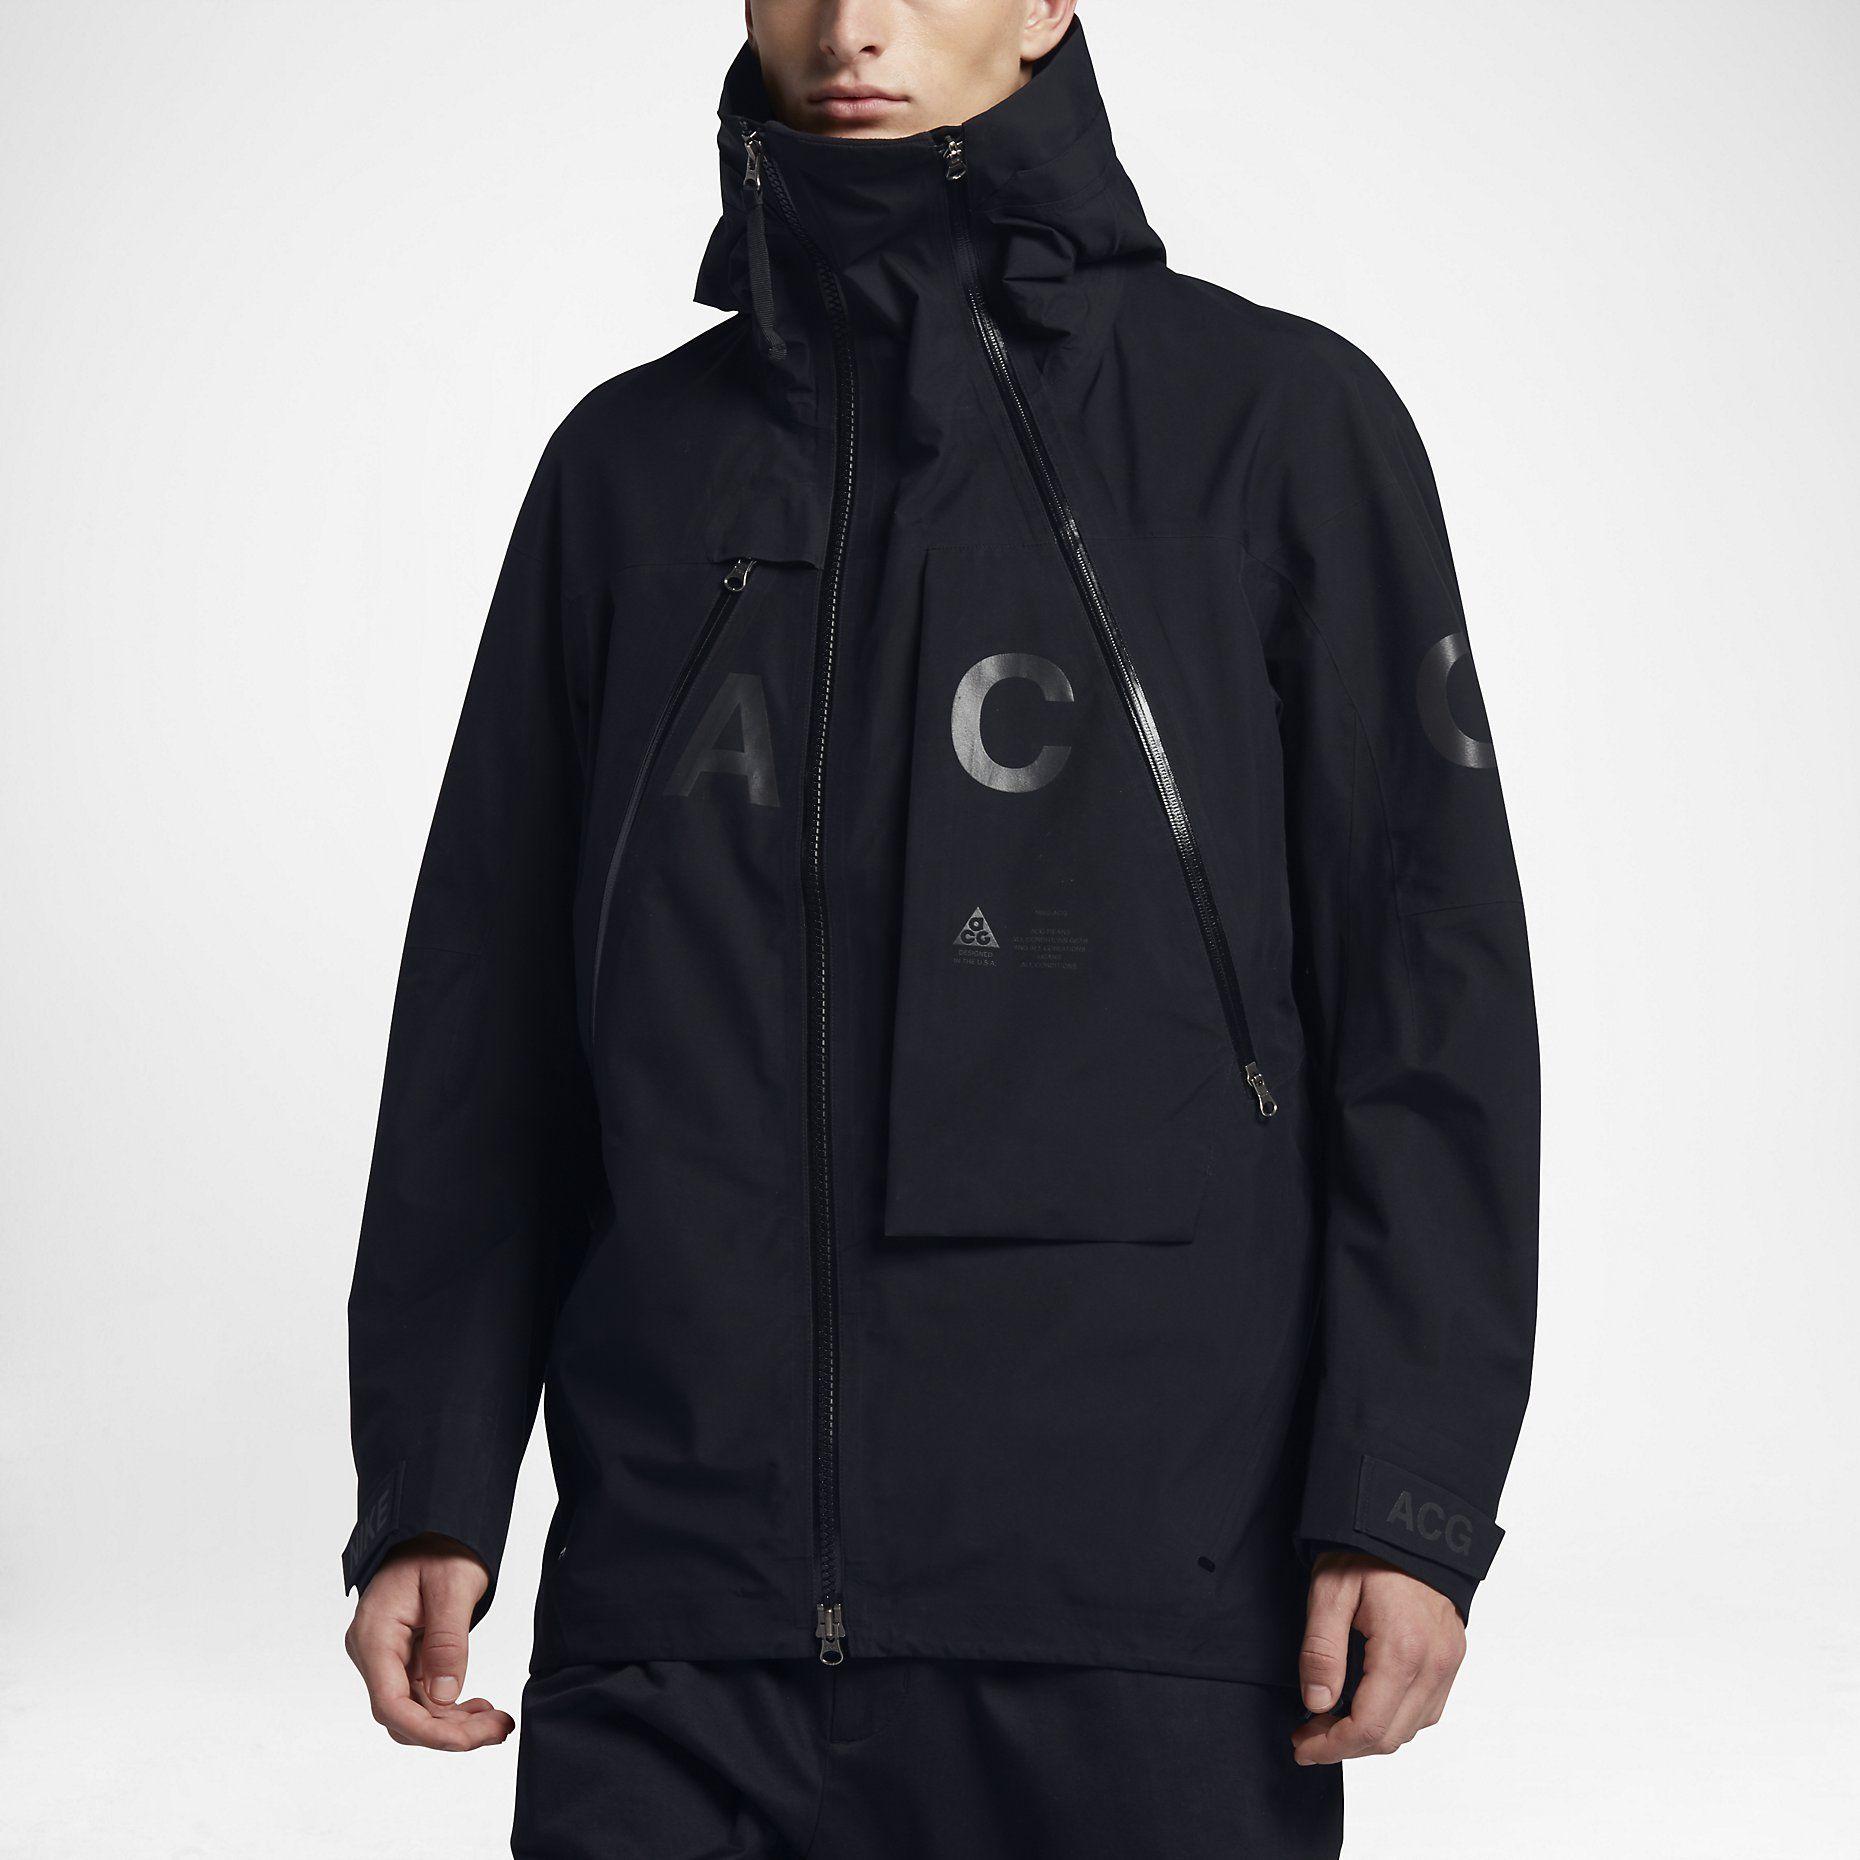 c25ecc3b Schwarz, Nike Acg Jacke, Sport Luxe, Burberry Prorsum, Business Kleidung,  Sportkleidung